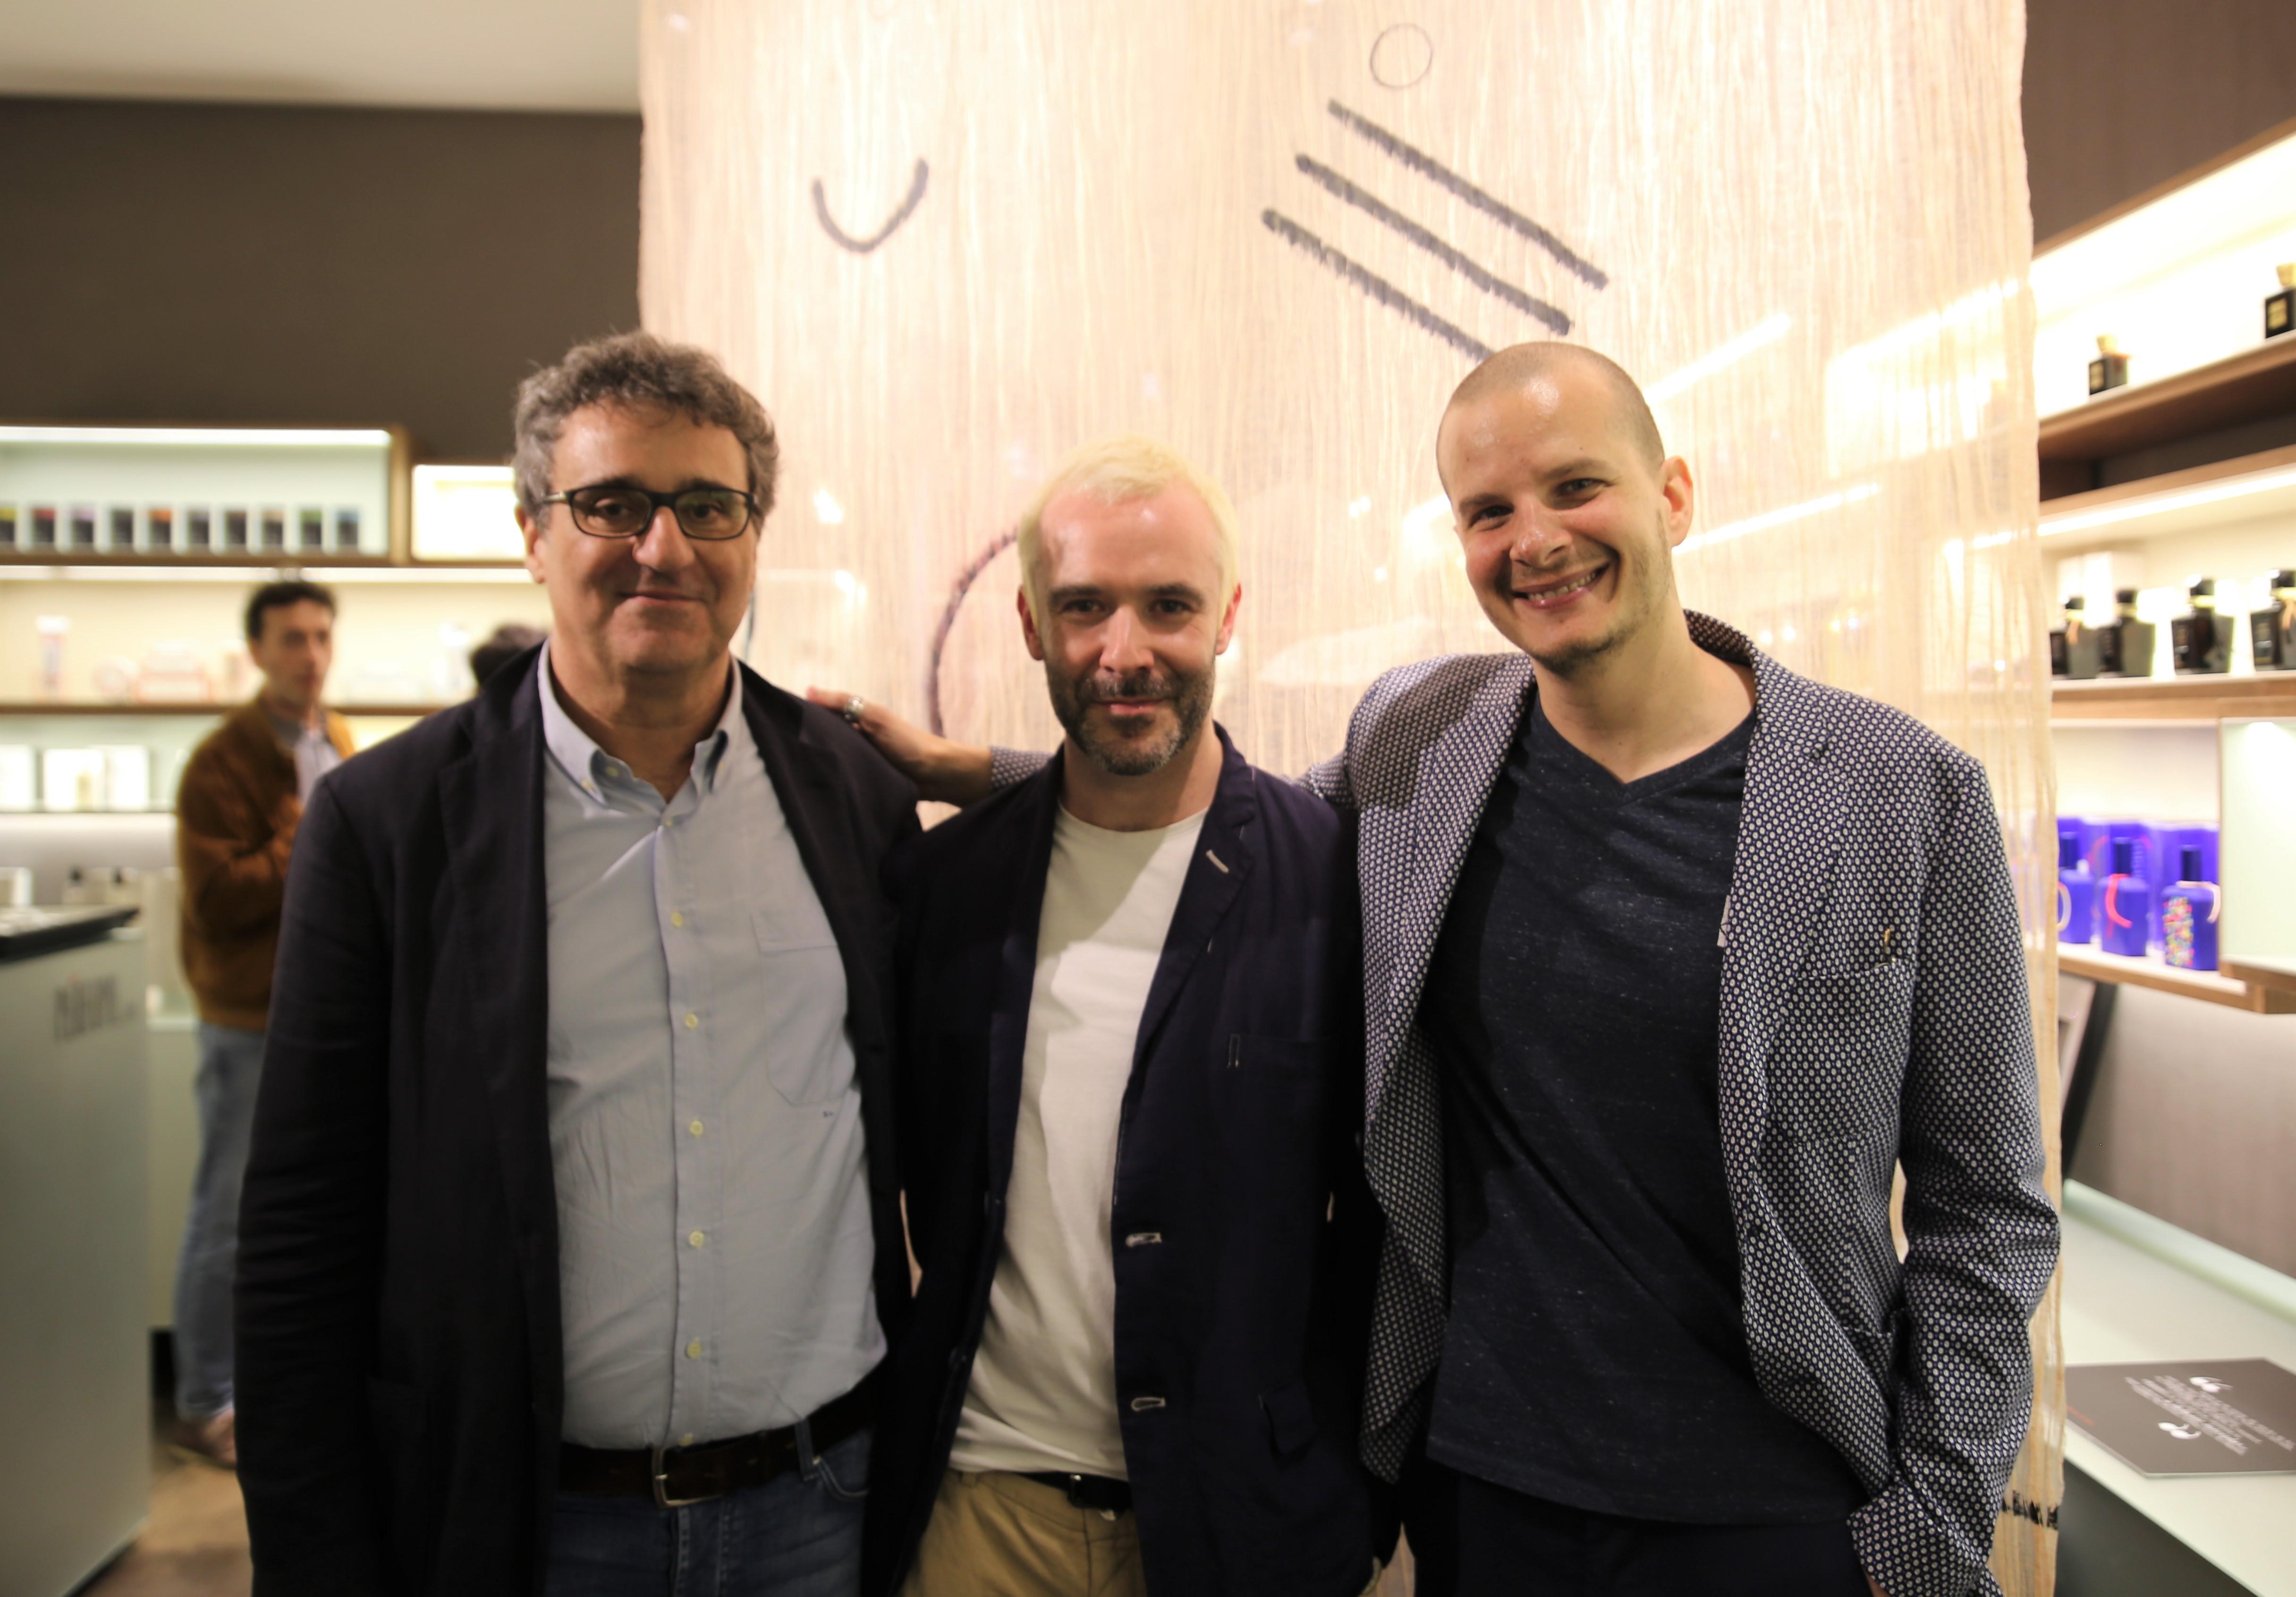 Philip Abussi Silvio Levi Nicola Gobbetto Milan Design Week